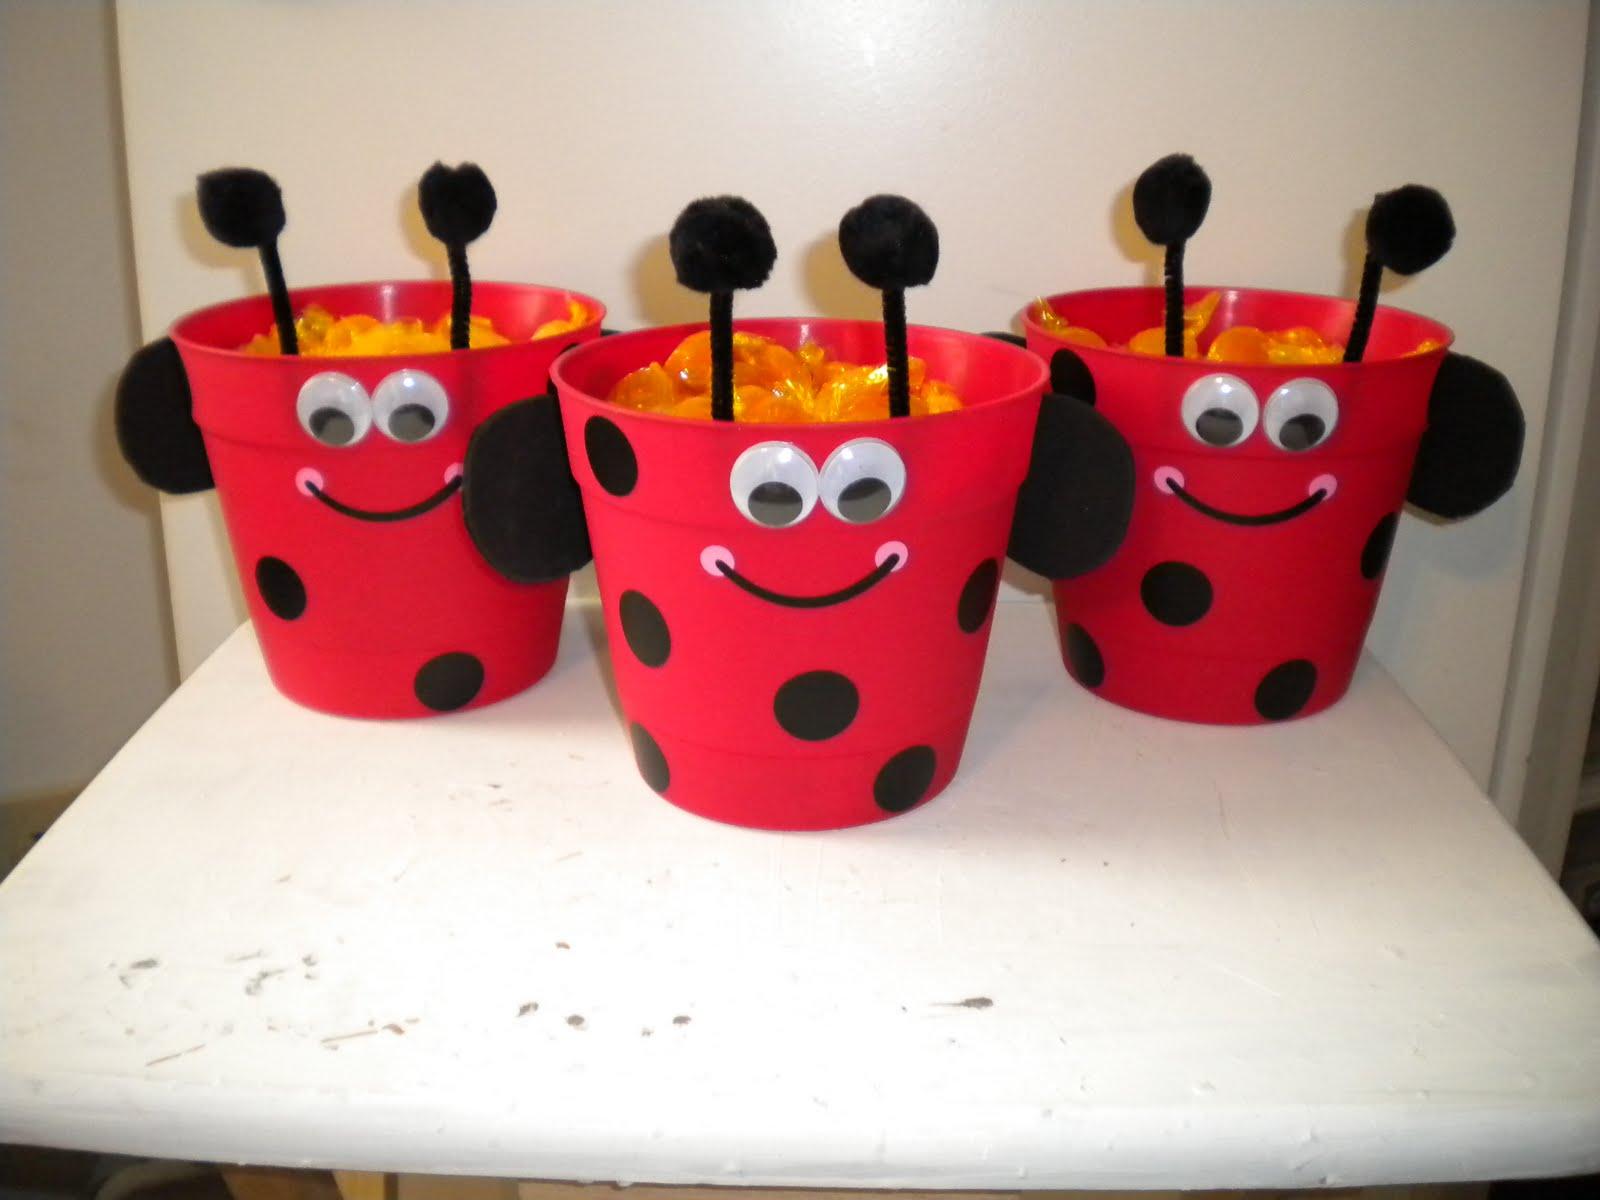 jean's crafty corner: ladybug flower pots for mother's day